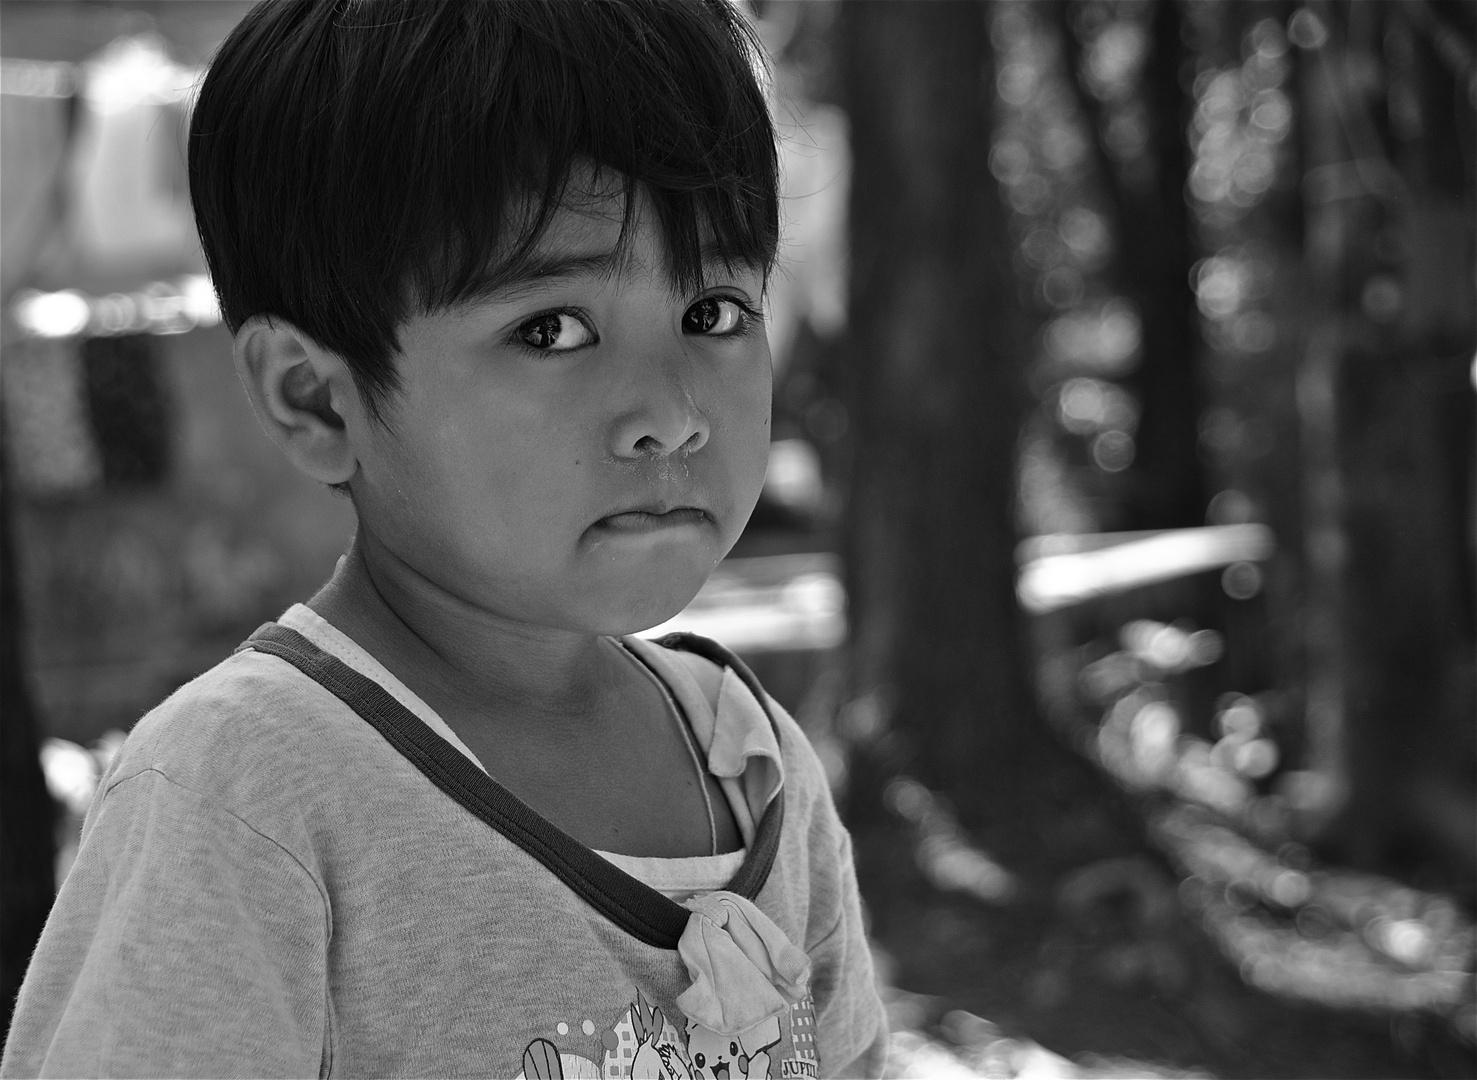 das Waisenhaus Seik Phu Taung in Kyaikhto IX